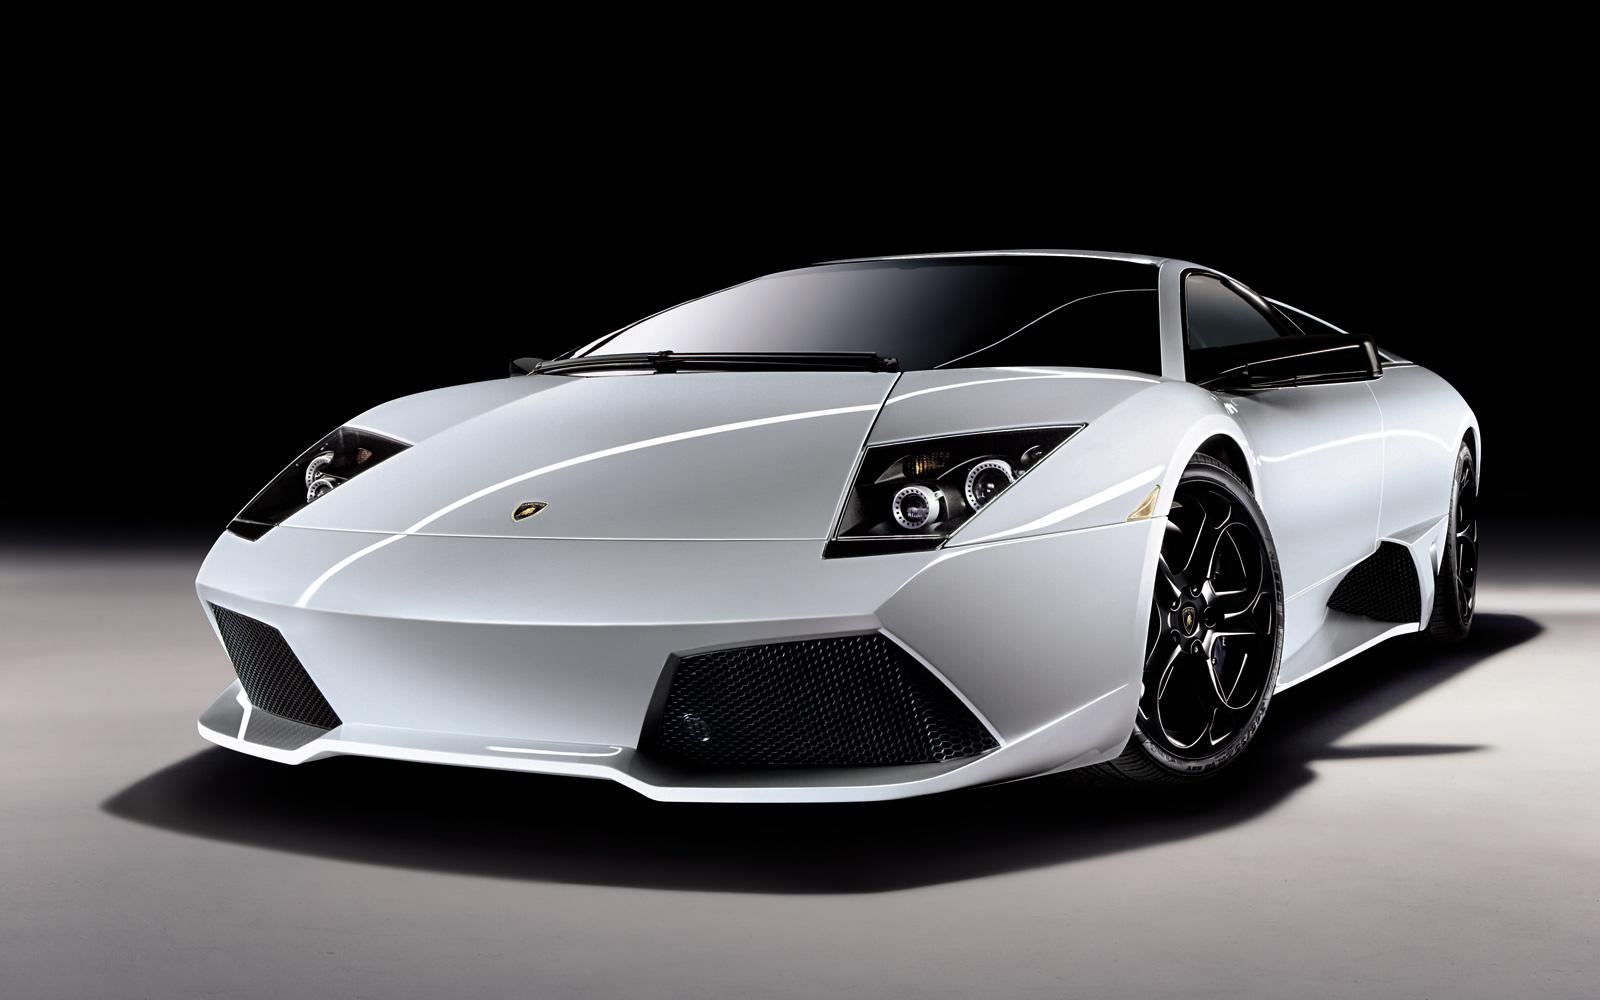 Lamborghini Murcielago LP640 Versace